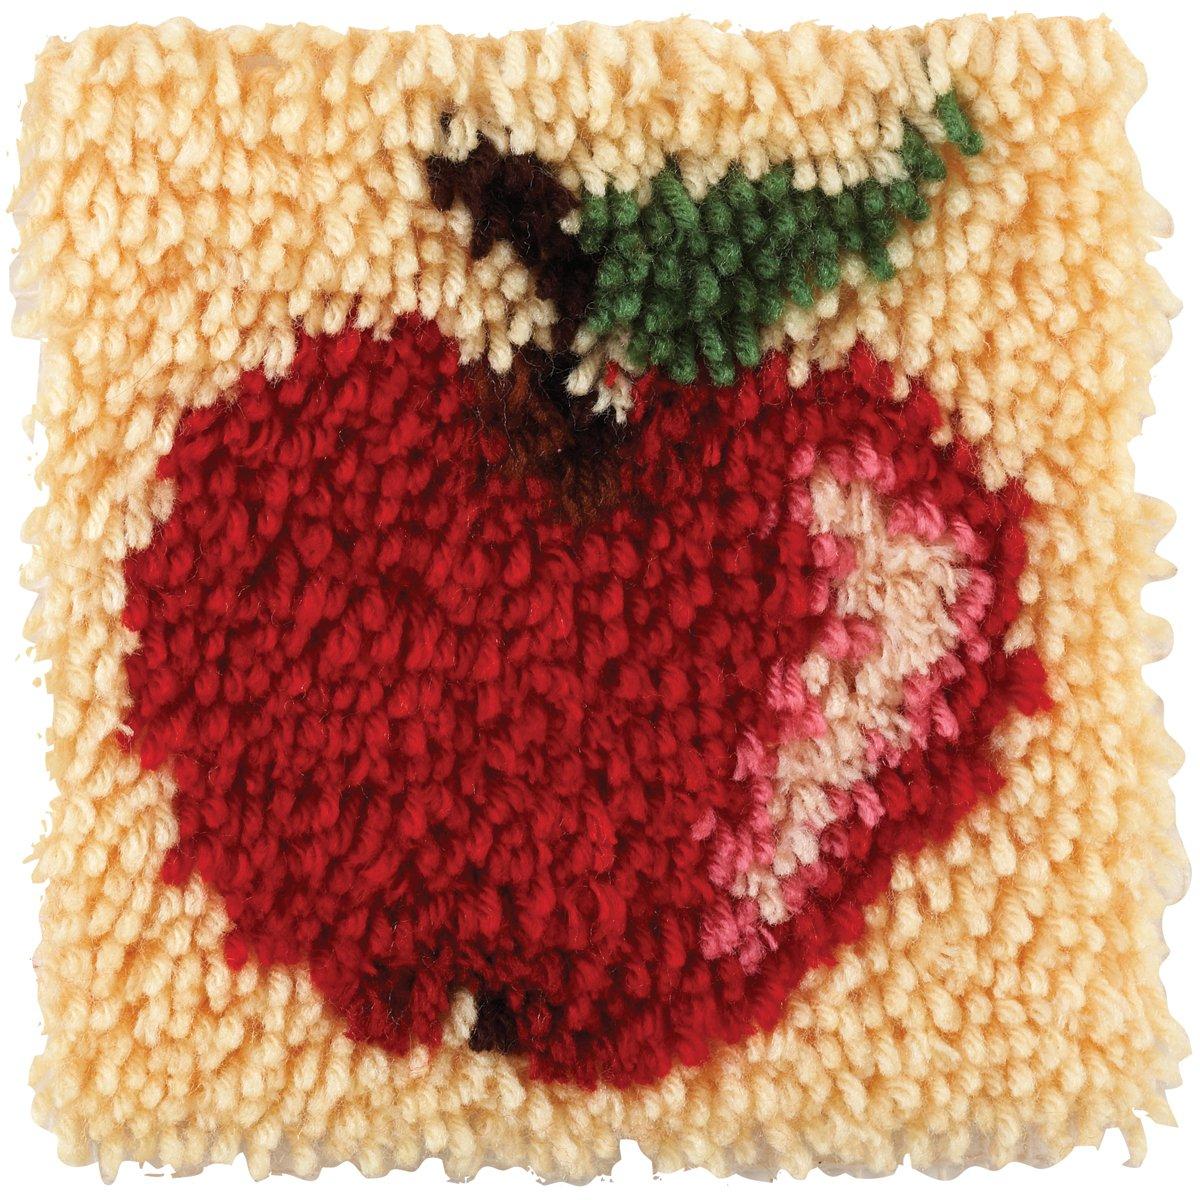 Spinrite Wonderart Latch Hook Kit, 8 by 8-Inch, Apple 426101